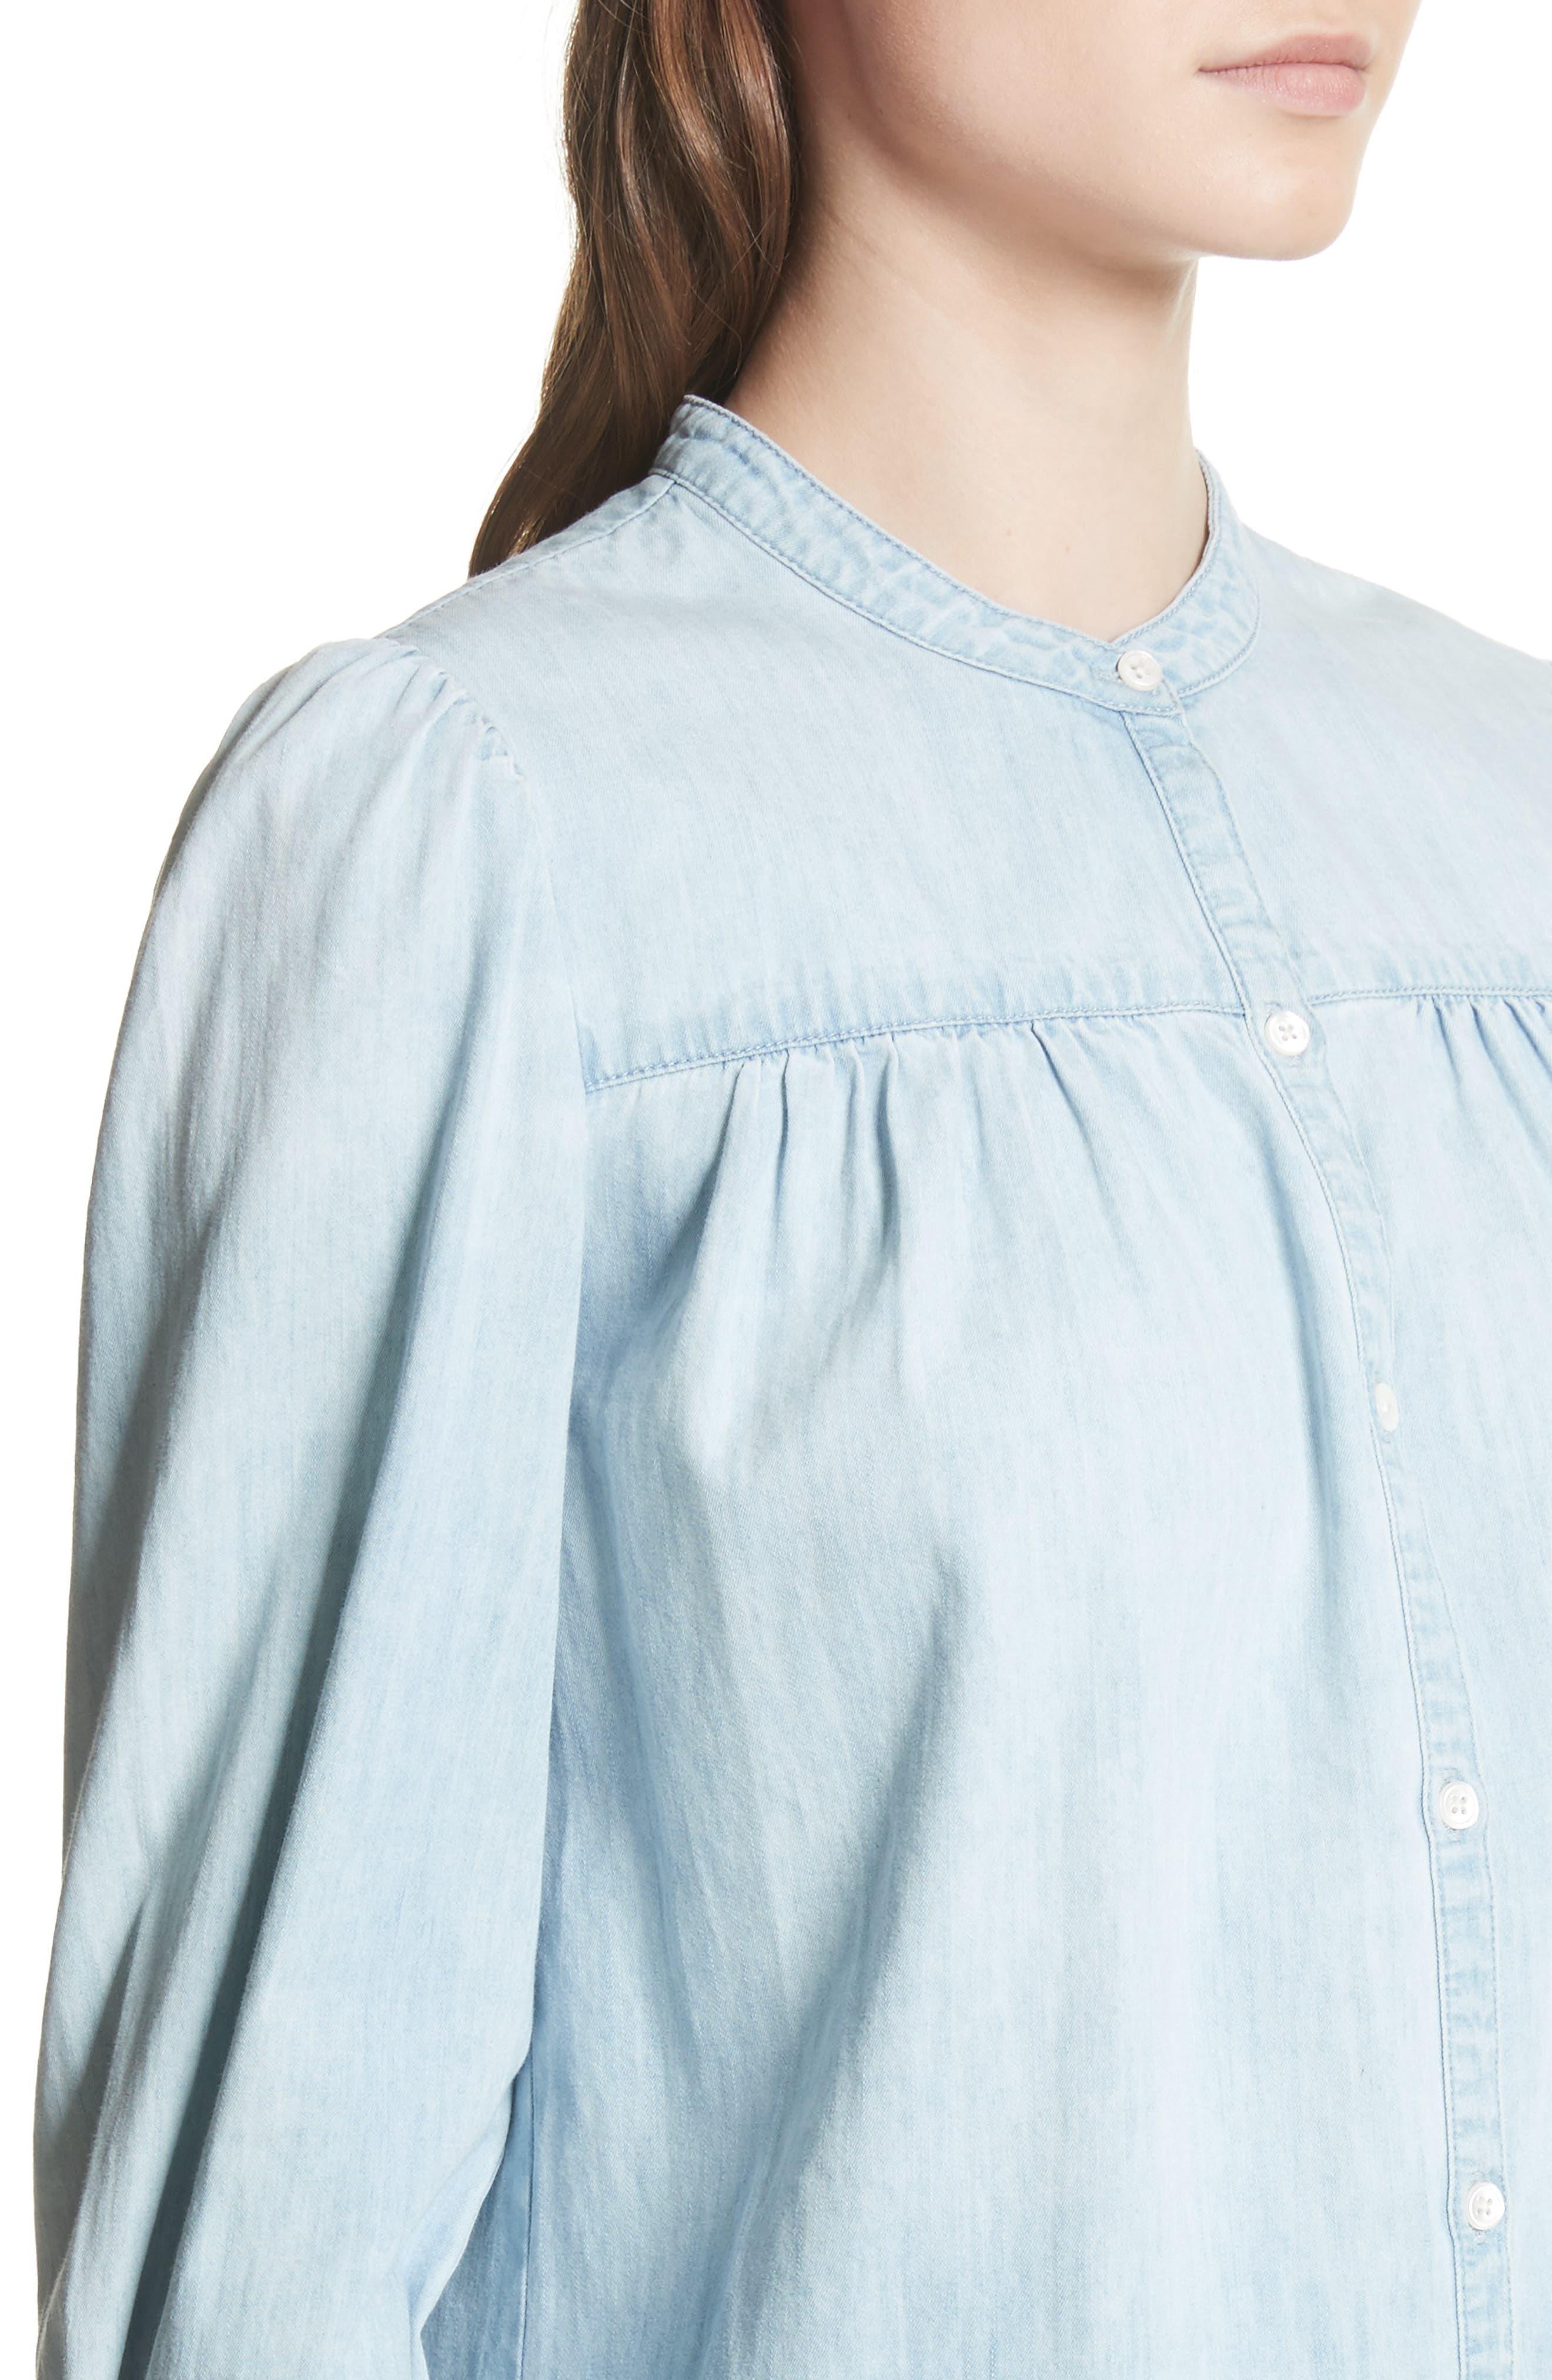 Aubrielle Silk Cotton Chambray Top,                             Alternate thumbnail 4, color,